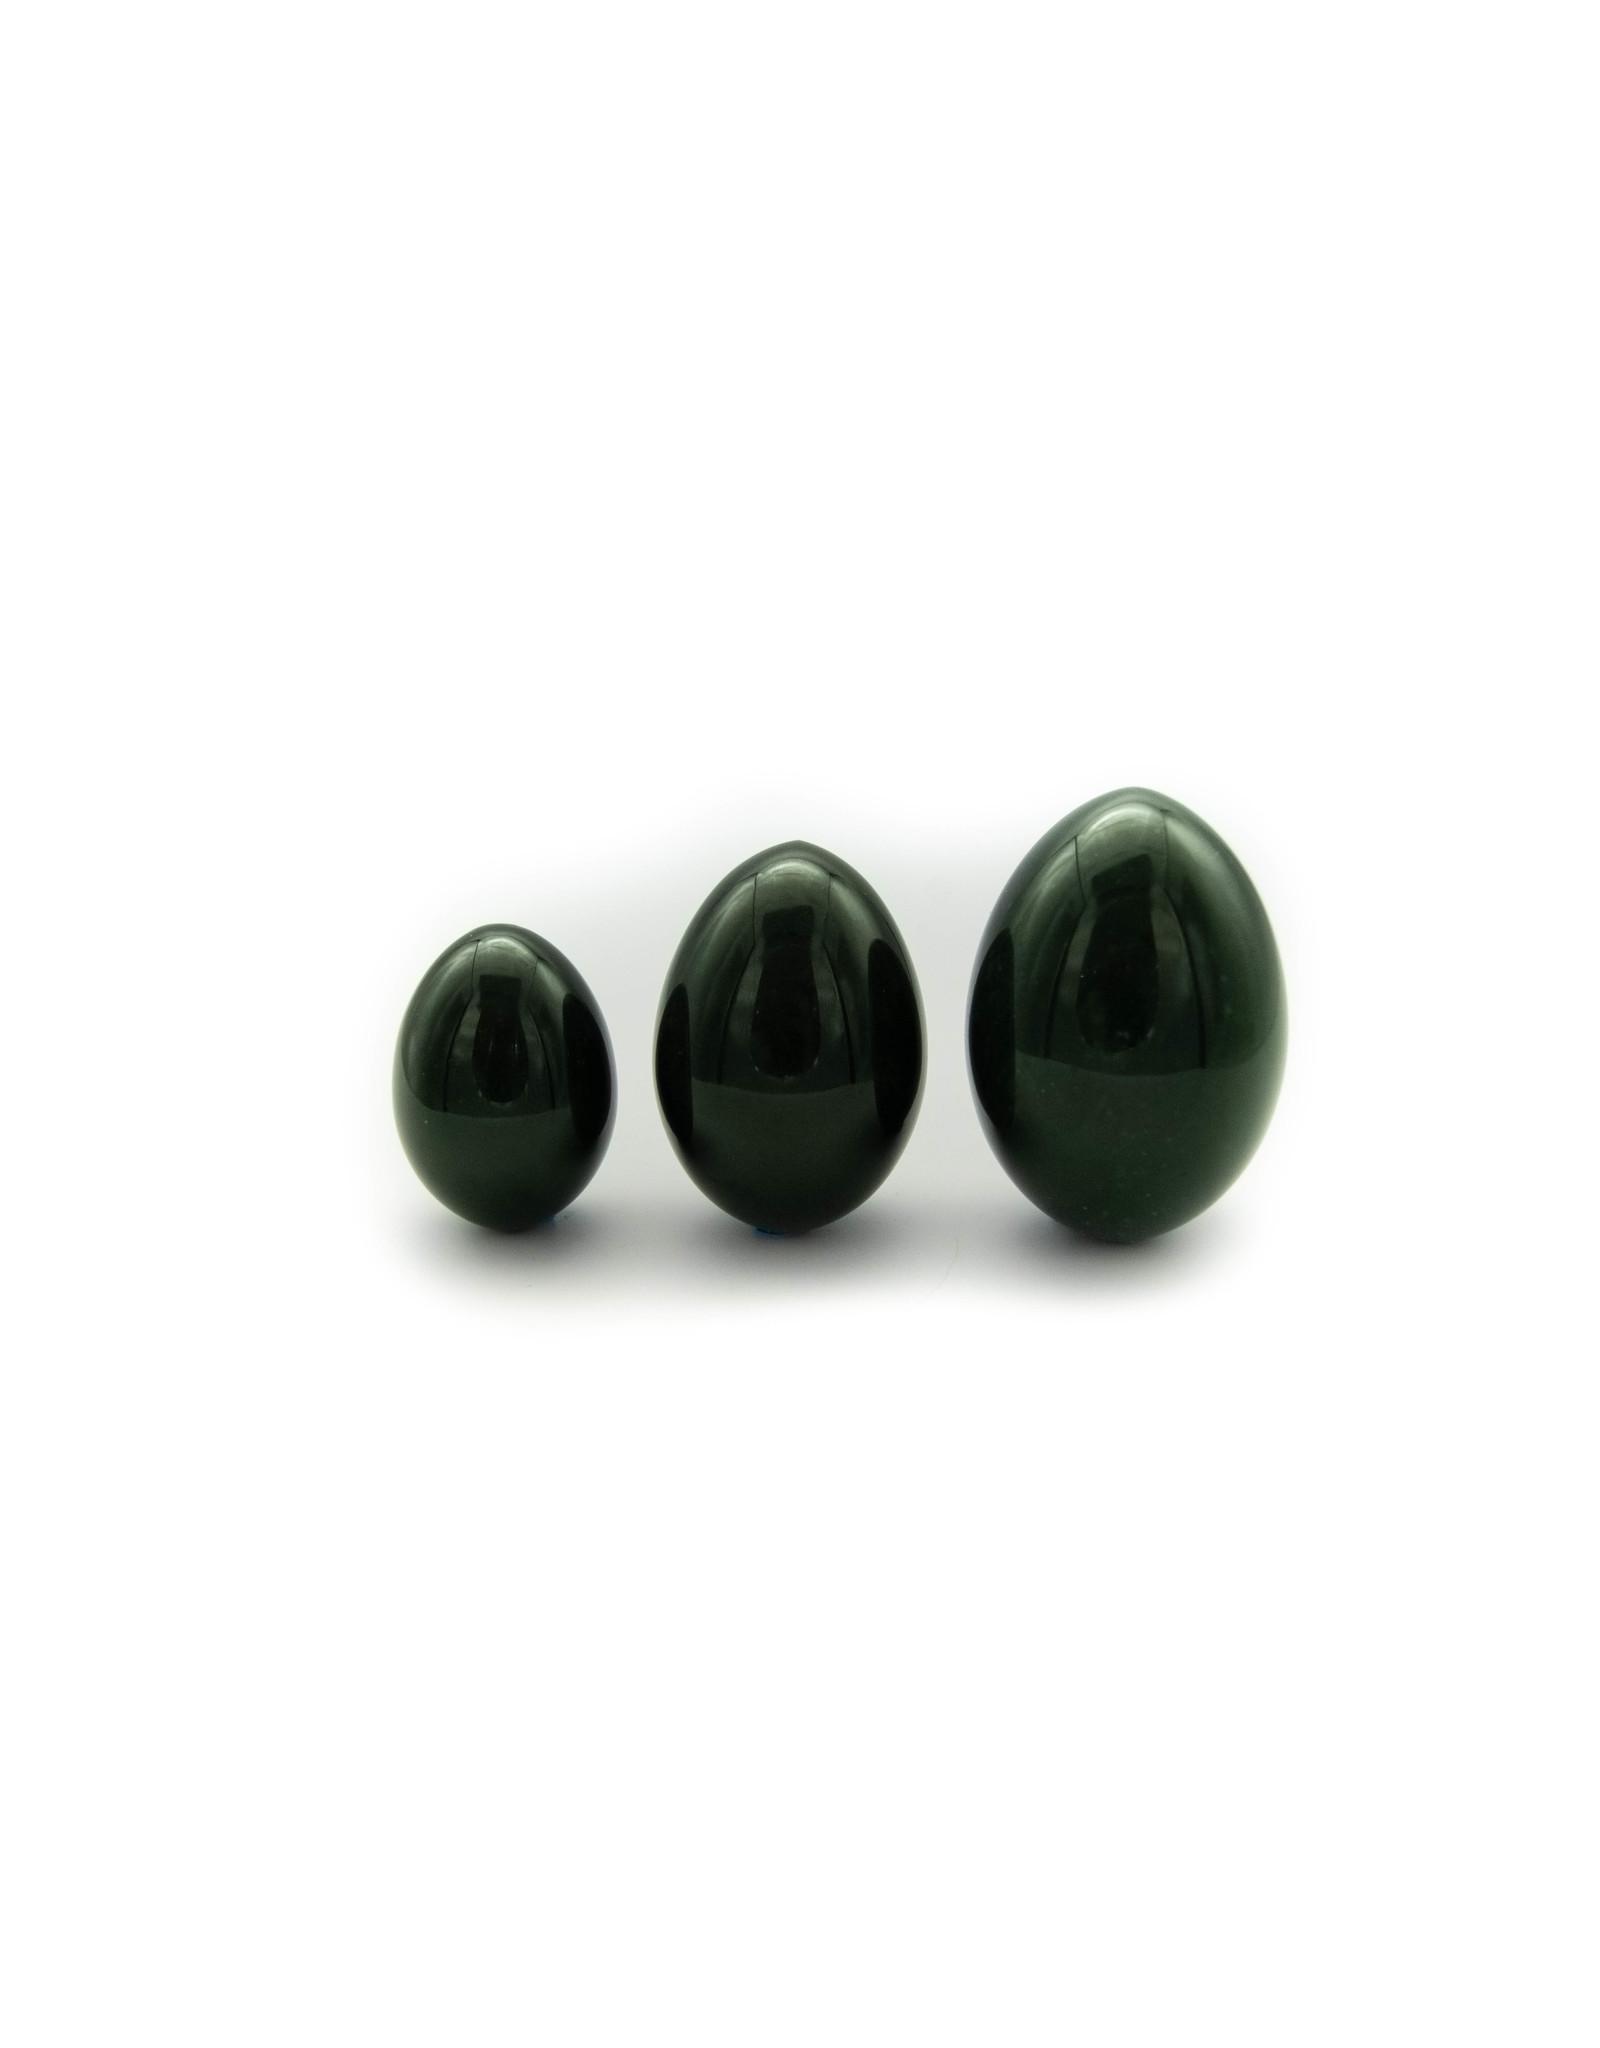 YONI Egg (Jade)